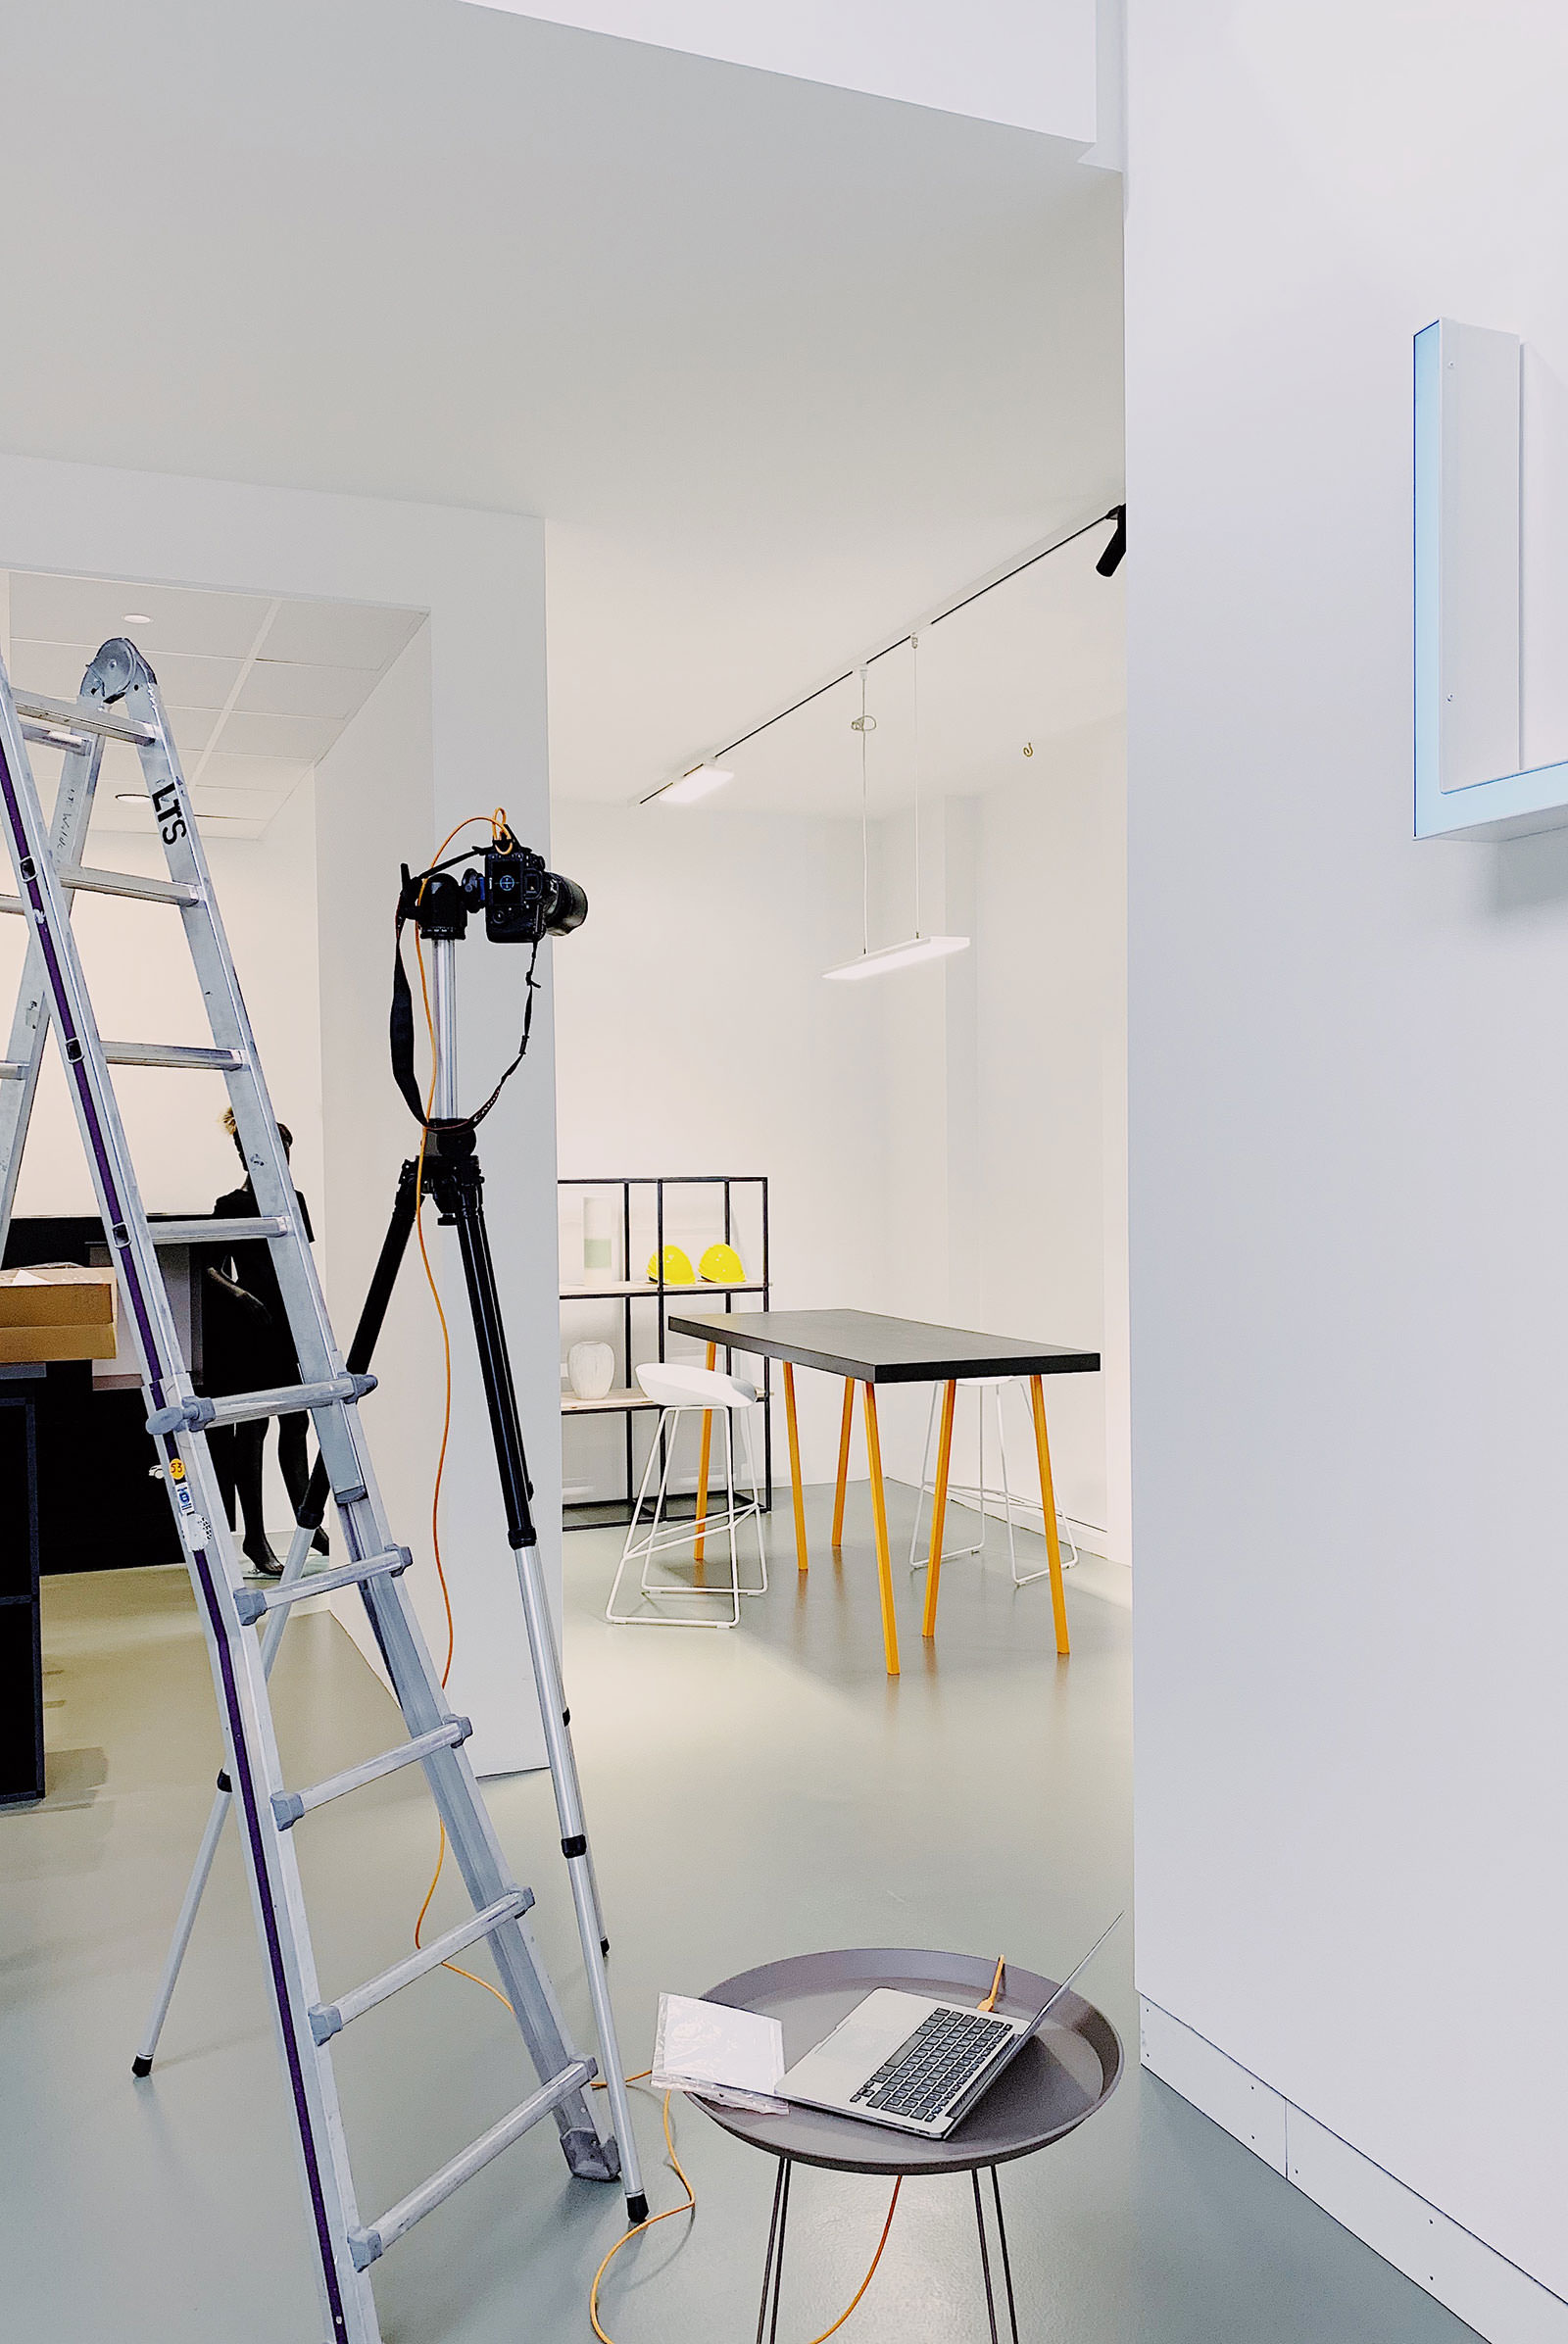 Catalog shooting, Showroom from LTS, Tettnang, June 2019